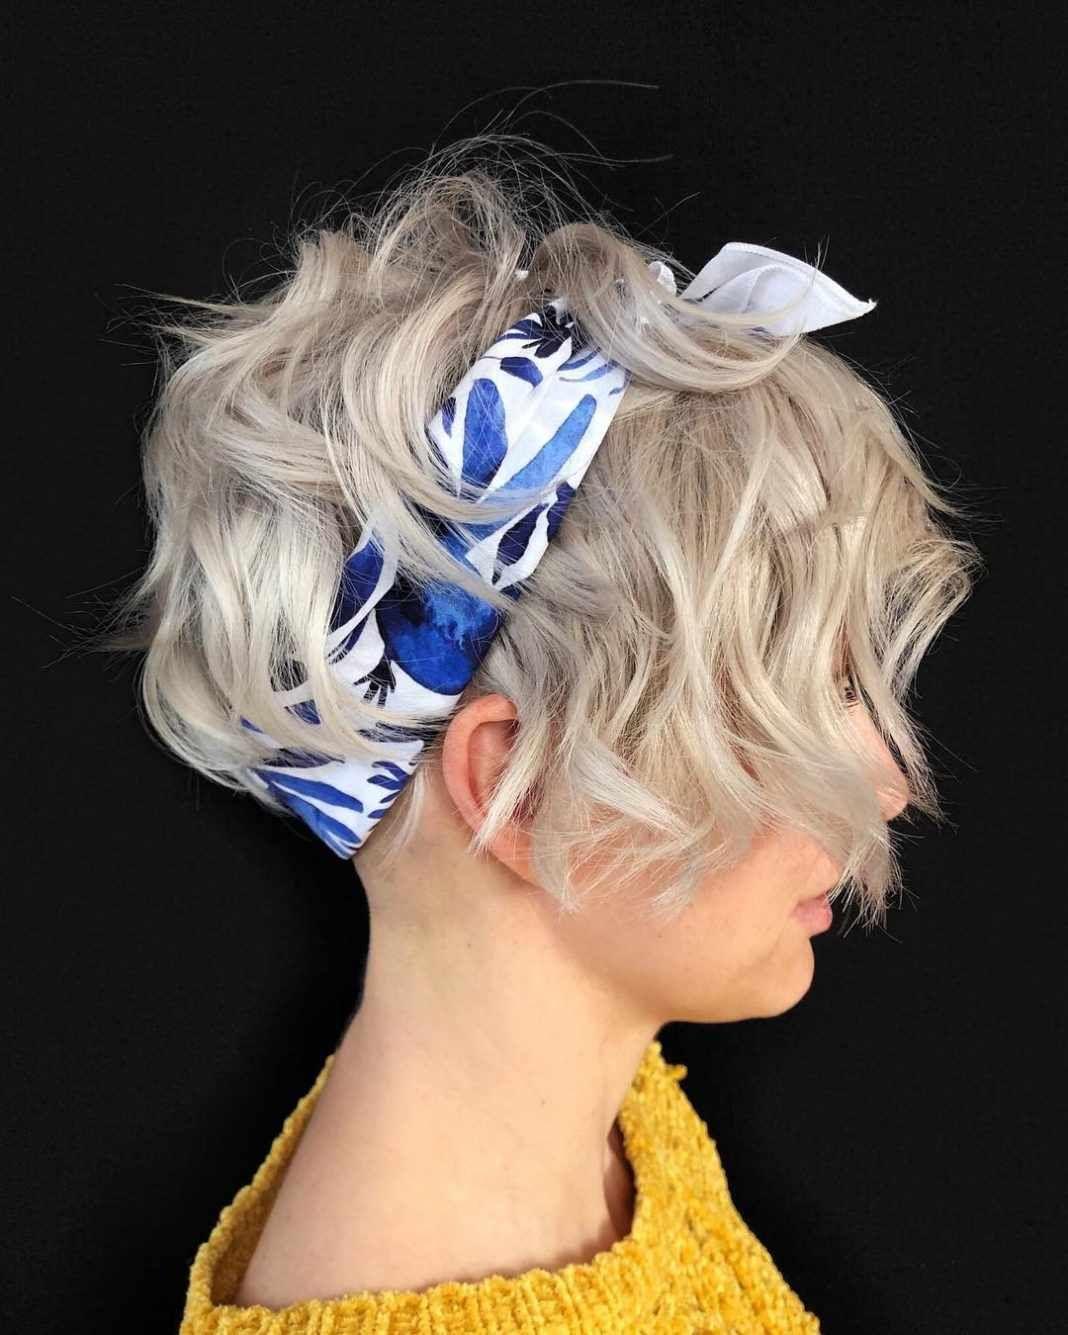 35 Best Female Haircut Style For Short Hair – Styles Art